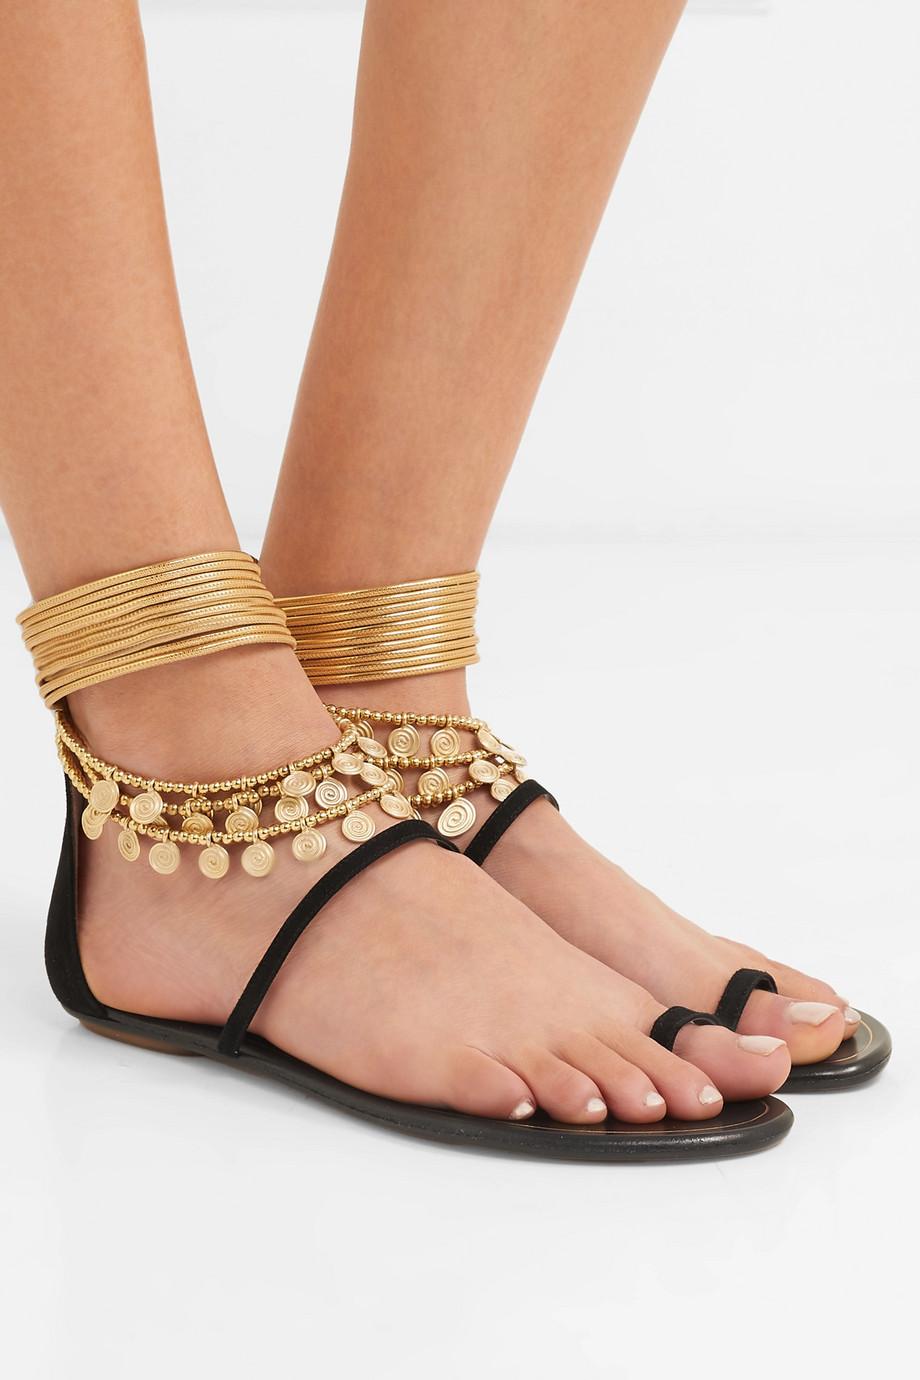 Aquazzura Queen Of The Desert 缀饰绒面革凉鞋